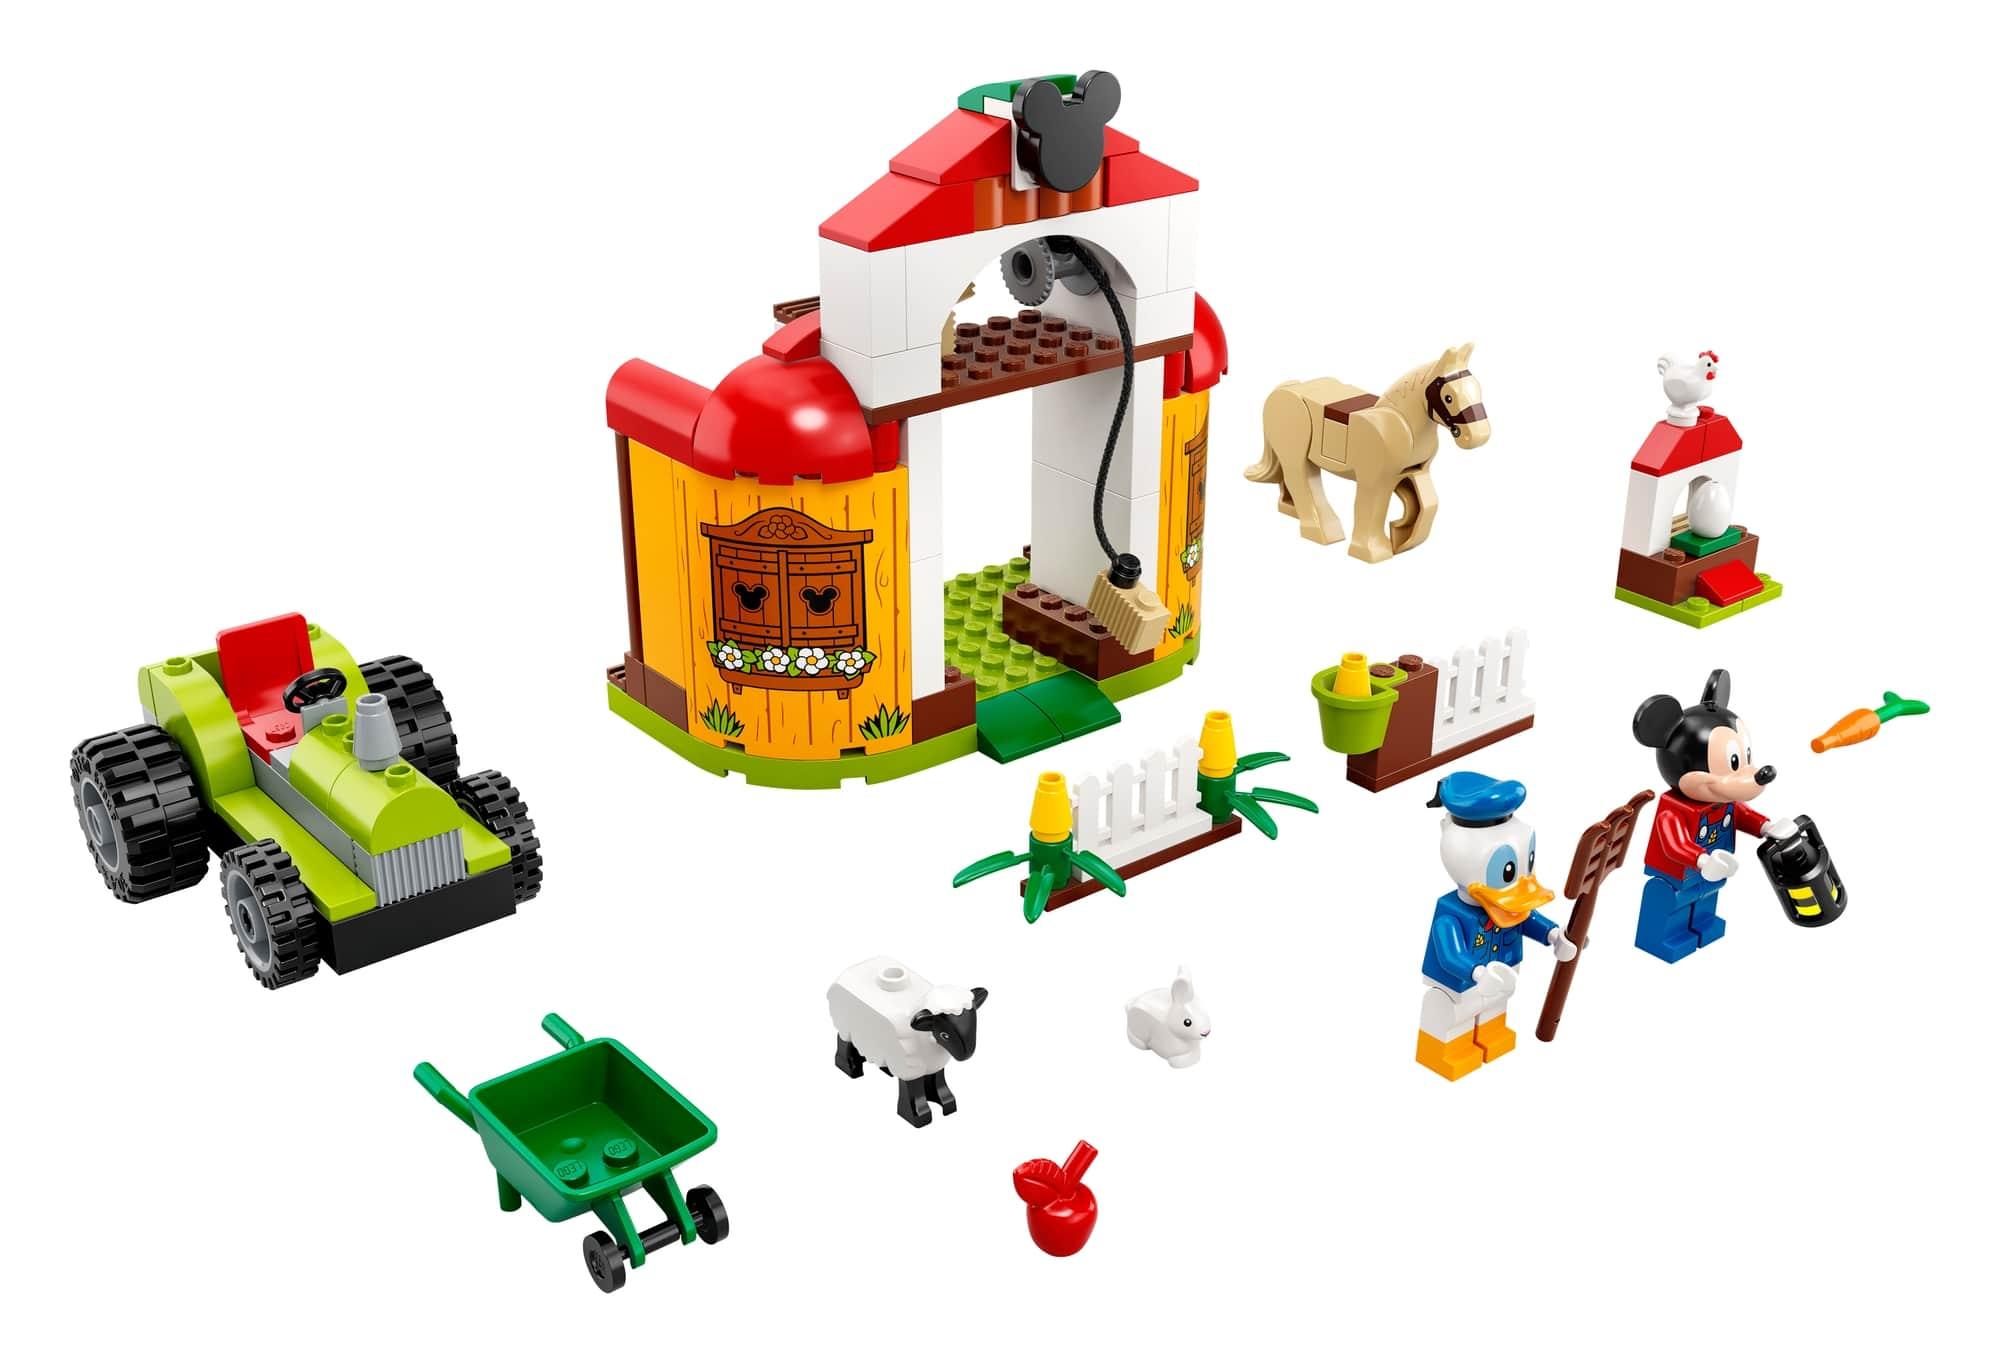 LEGO Disney 10775 Mickys Und Donald Duck's Farm 3